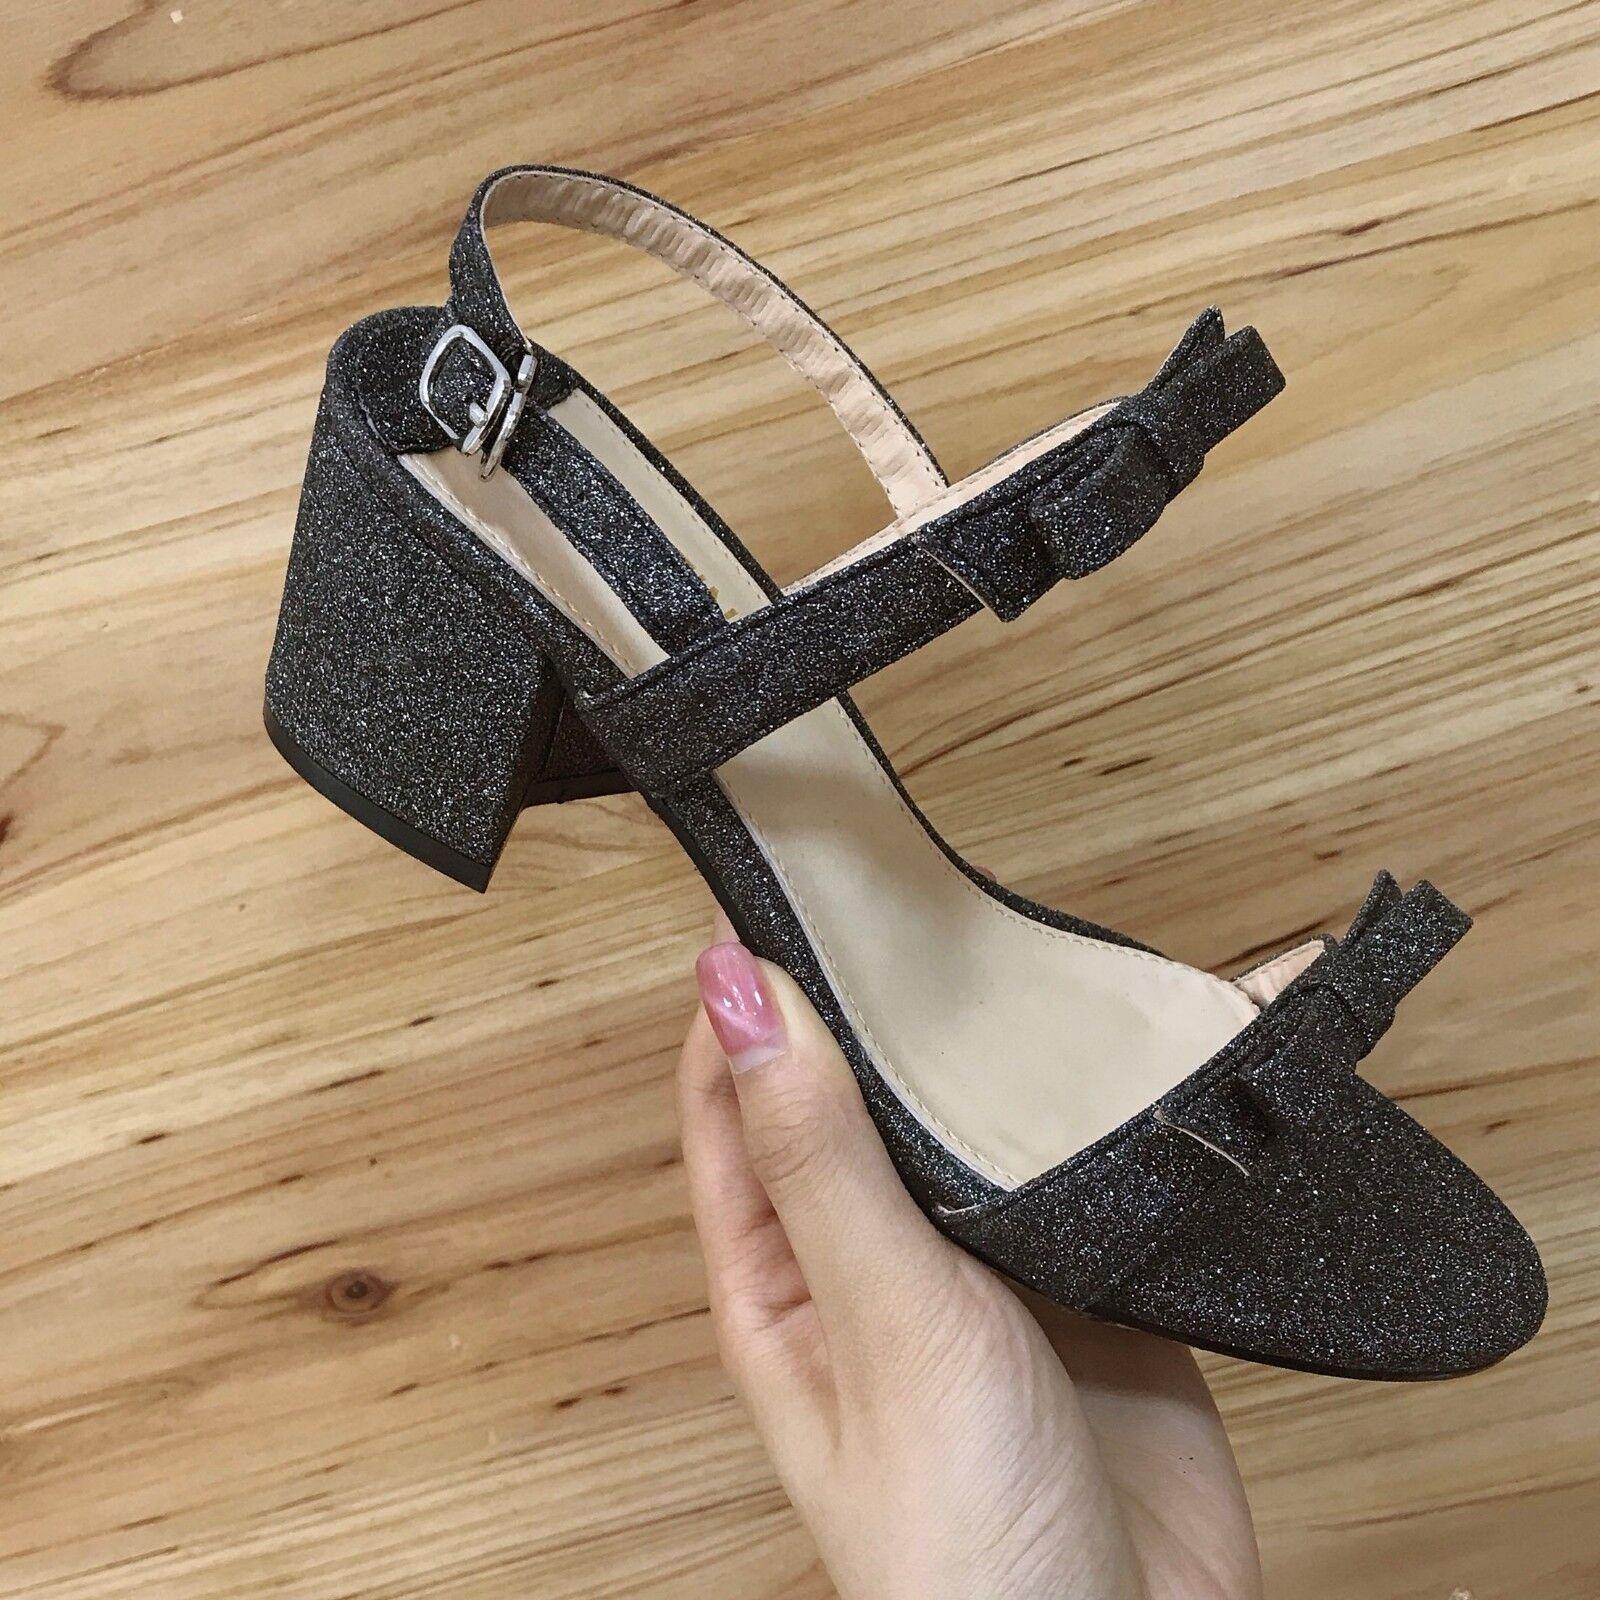 Sandalen 7 cm elegant schwarz glanz absatz quadrat sandalen simil leder 1093   | Louis, ausführlich